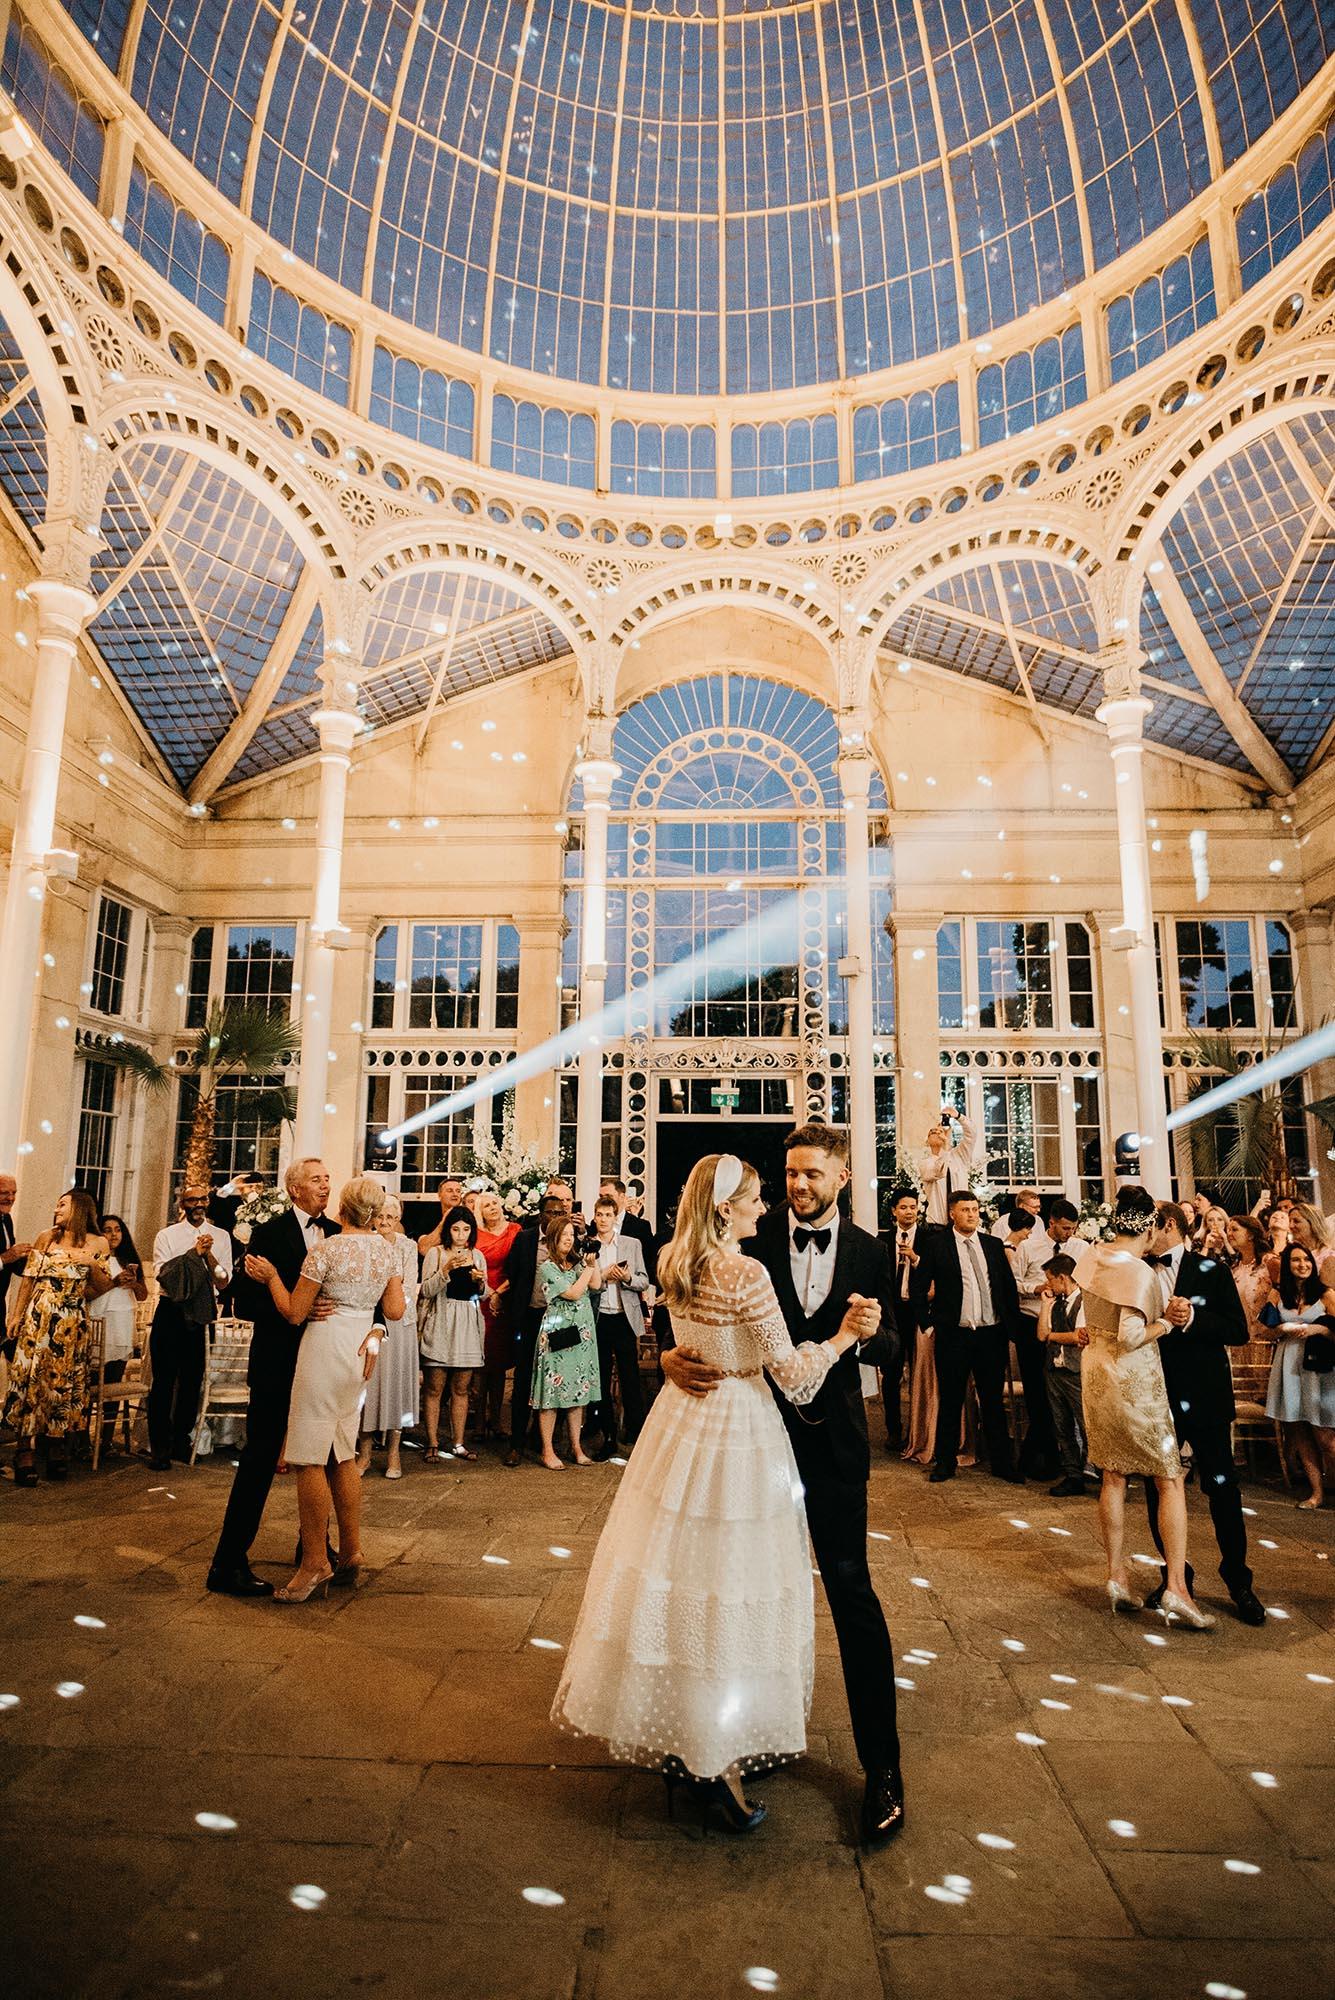 Syon House wedding photographer